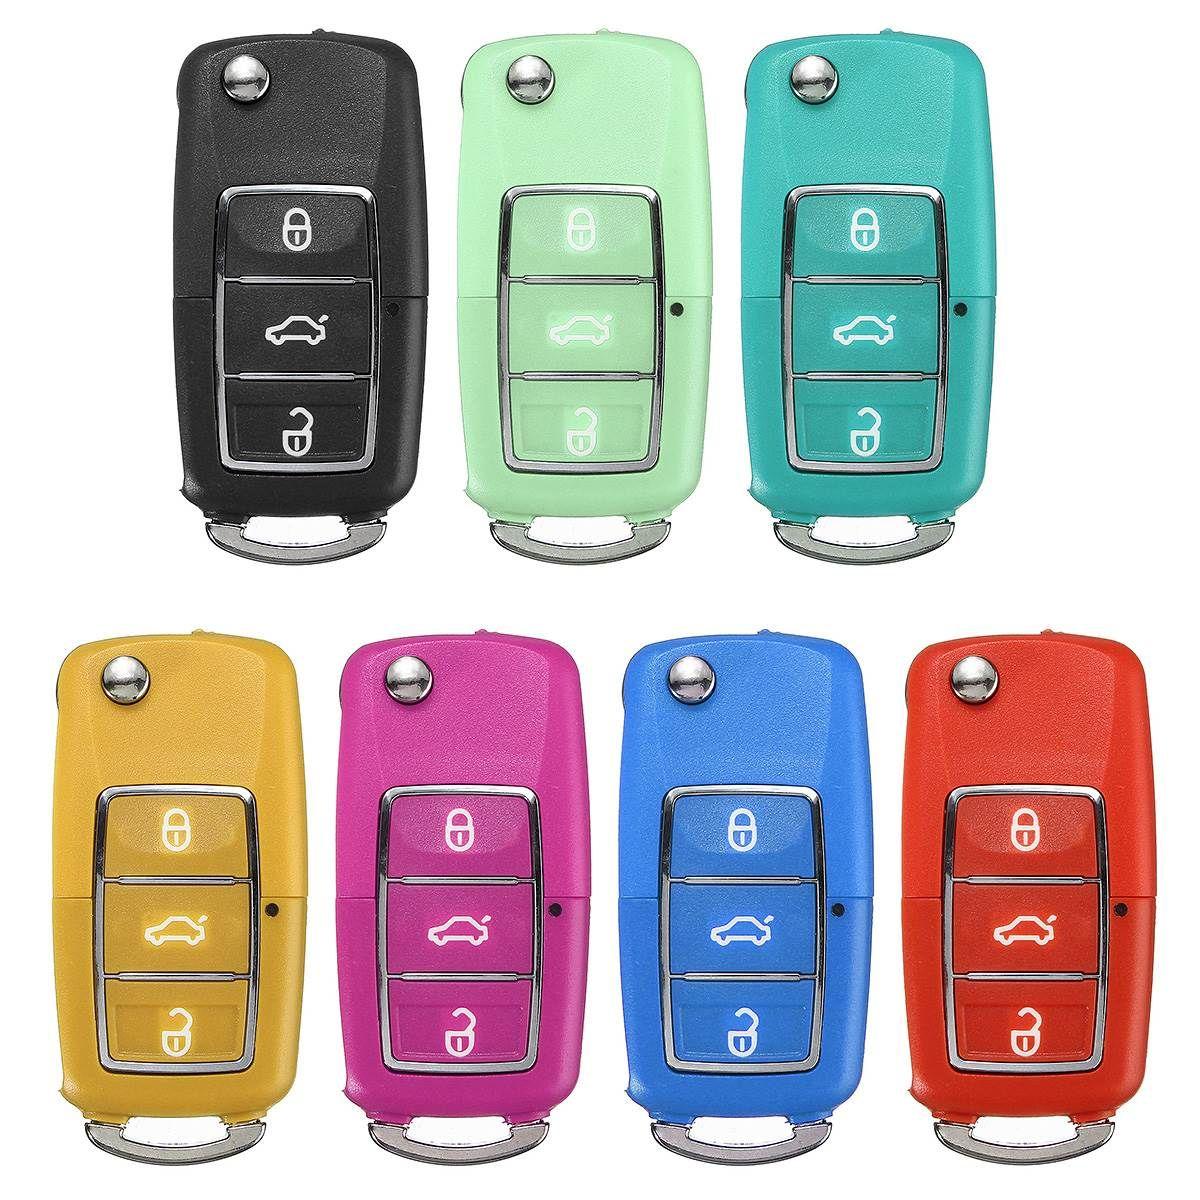 3 taste Key Fob Fall Shell Cover Ersatz Für VW Golf Passat Jeetle Jetta Polo Bora 71,7x34,3 x 17,5mm